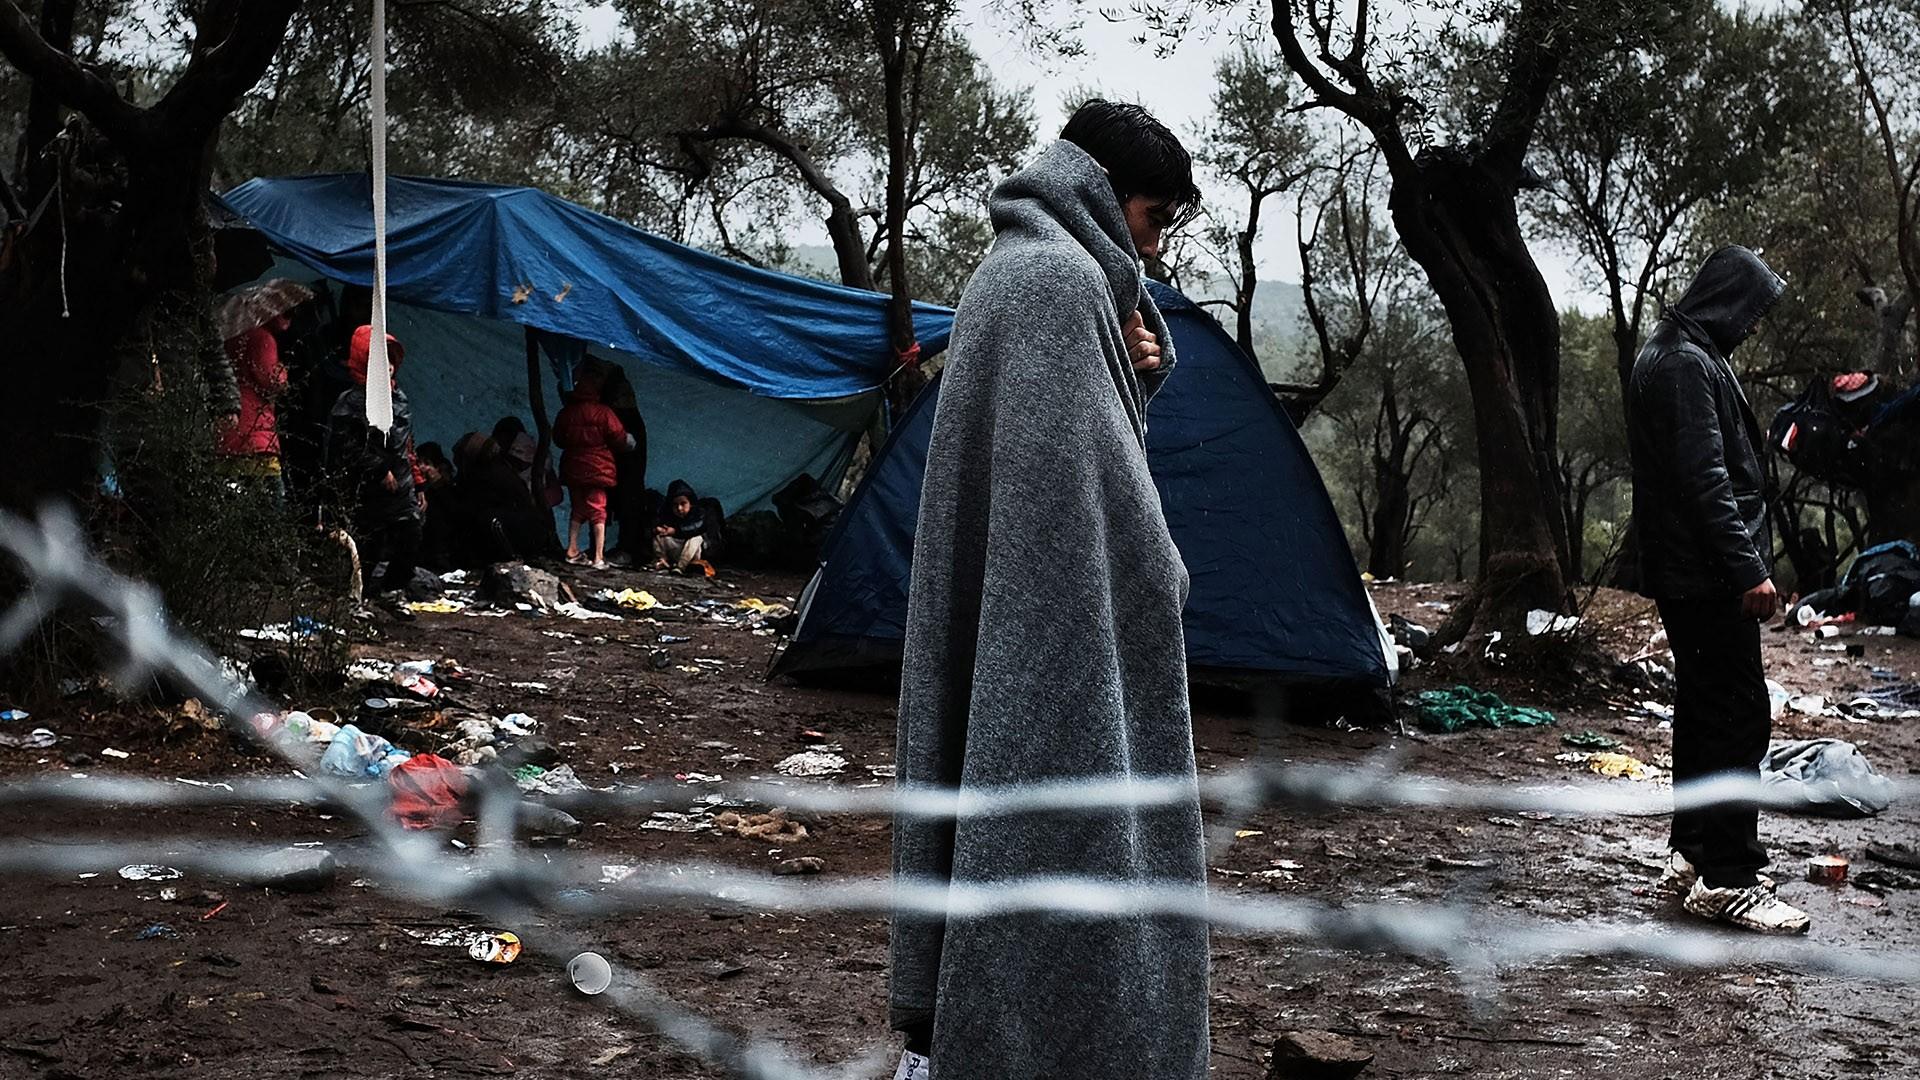 اللاجئون السوريون في اليونان